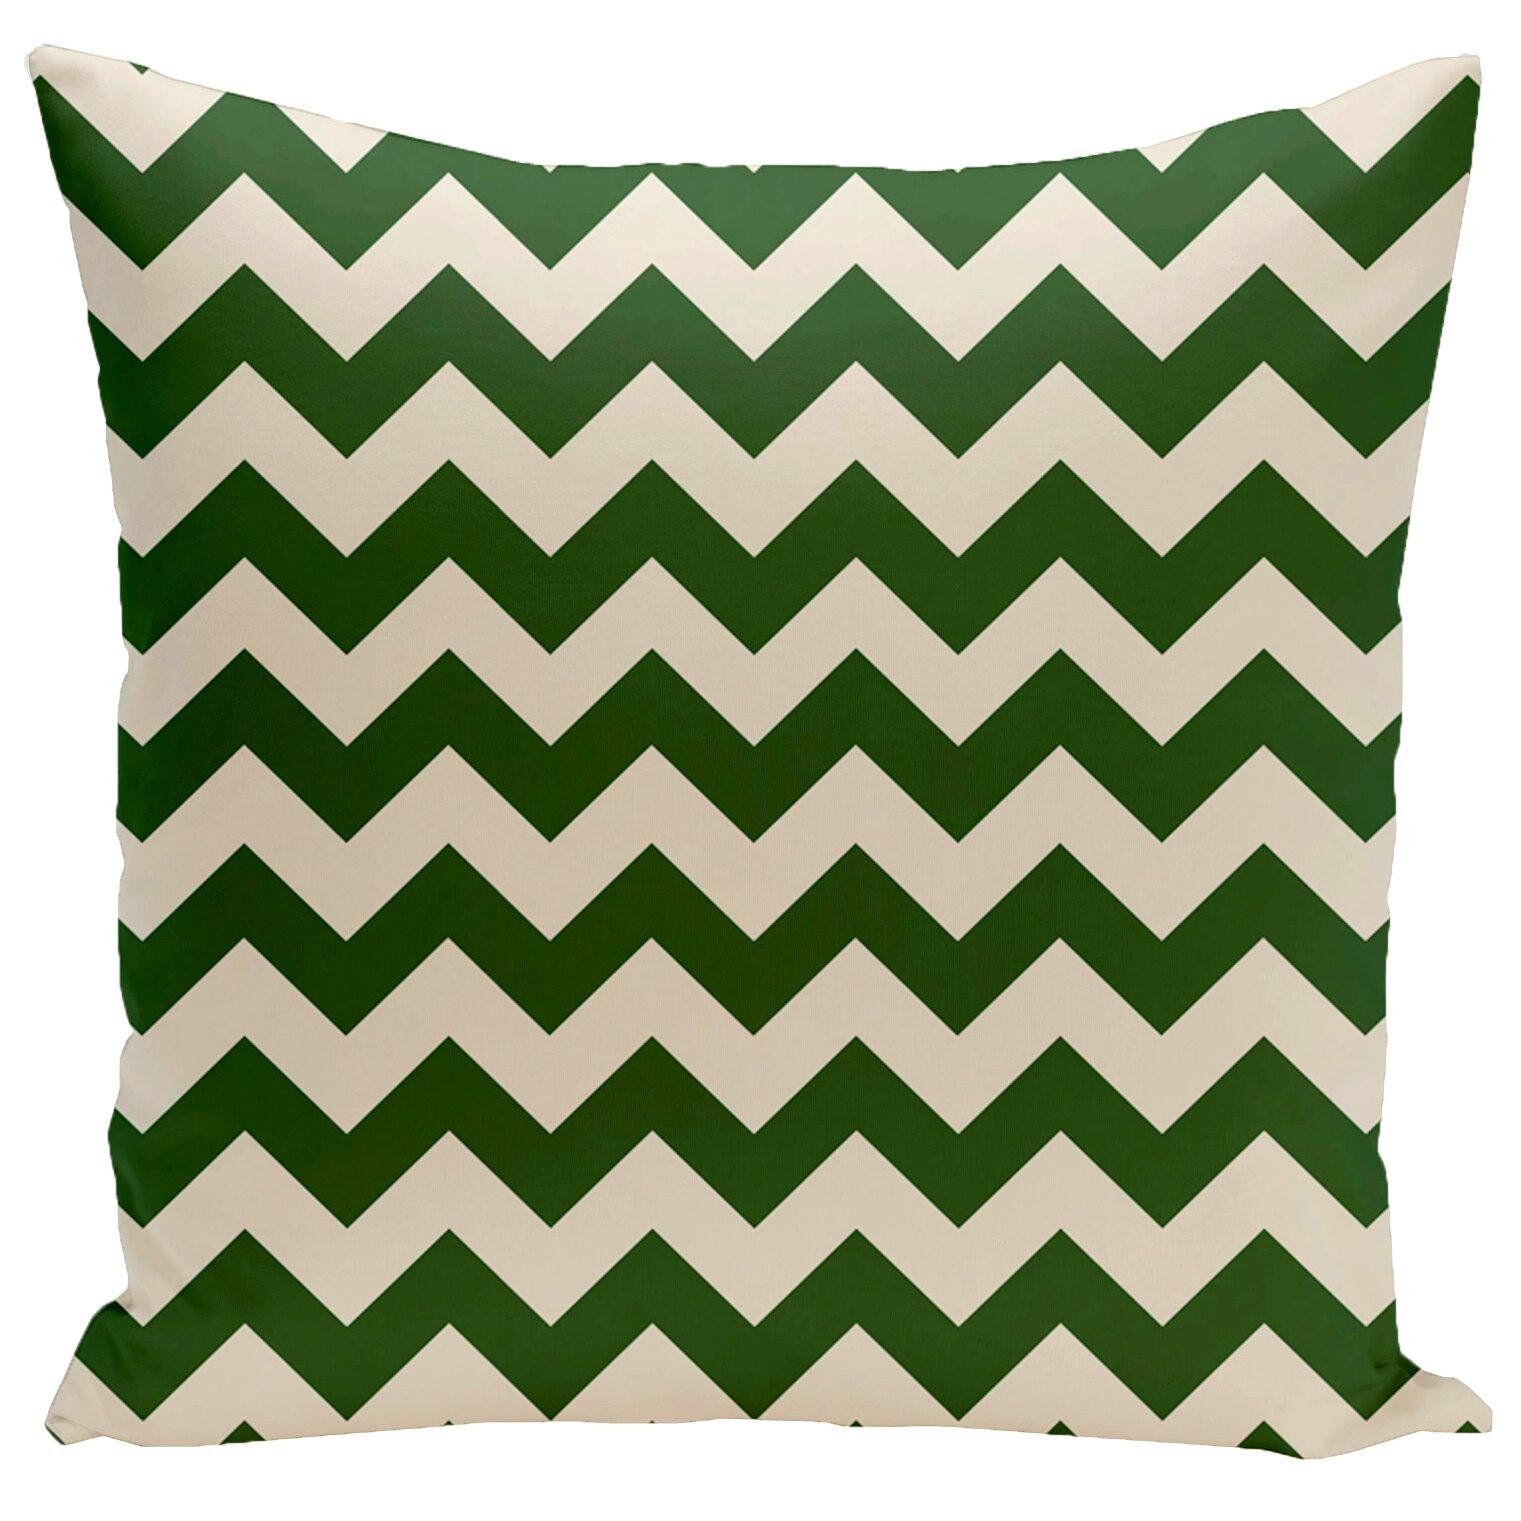 bunnell geometric throw pillow  reviews  allmodern - varick galleryreg bunnell geometric throw pillow